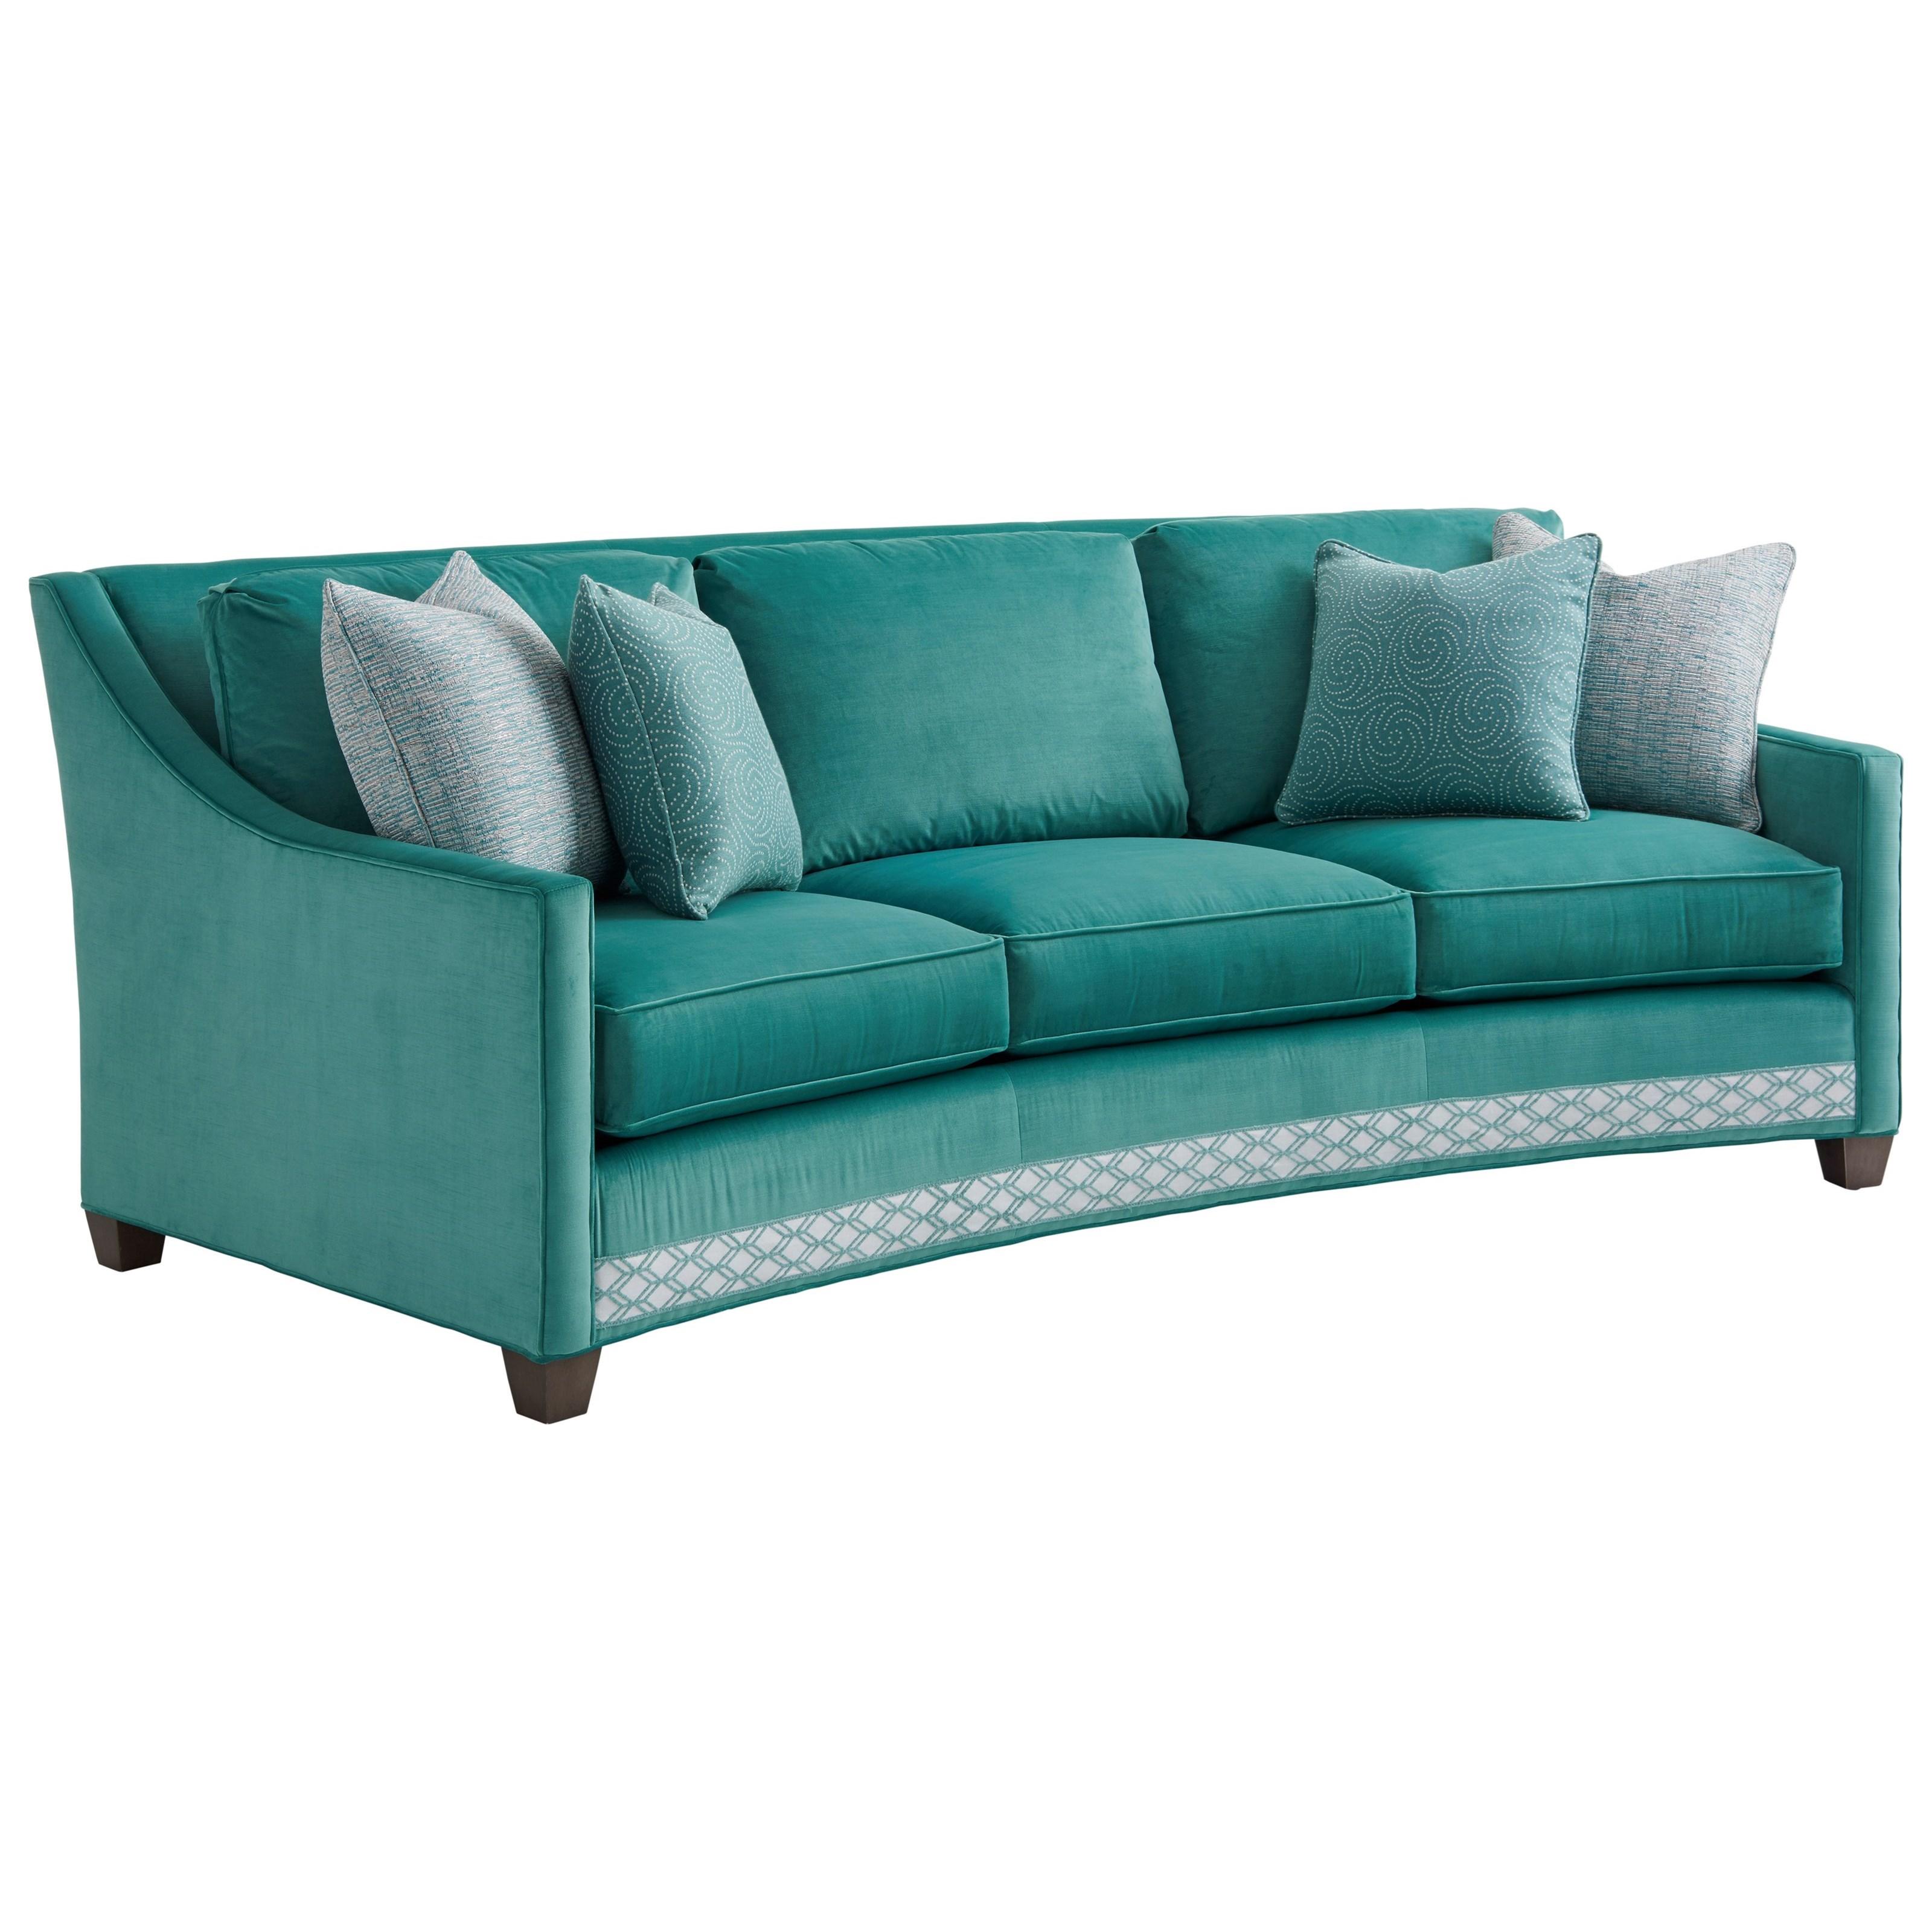 lexington sectional sofa fusion furniture 1140 grande mist zavala kahn home brands